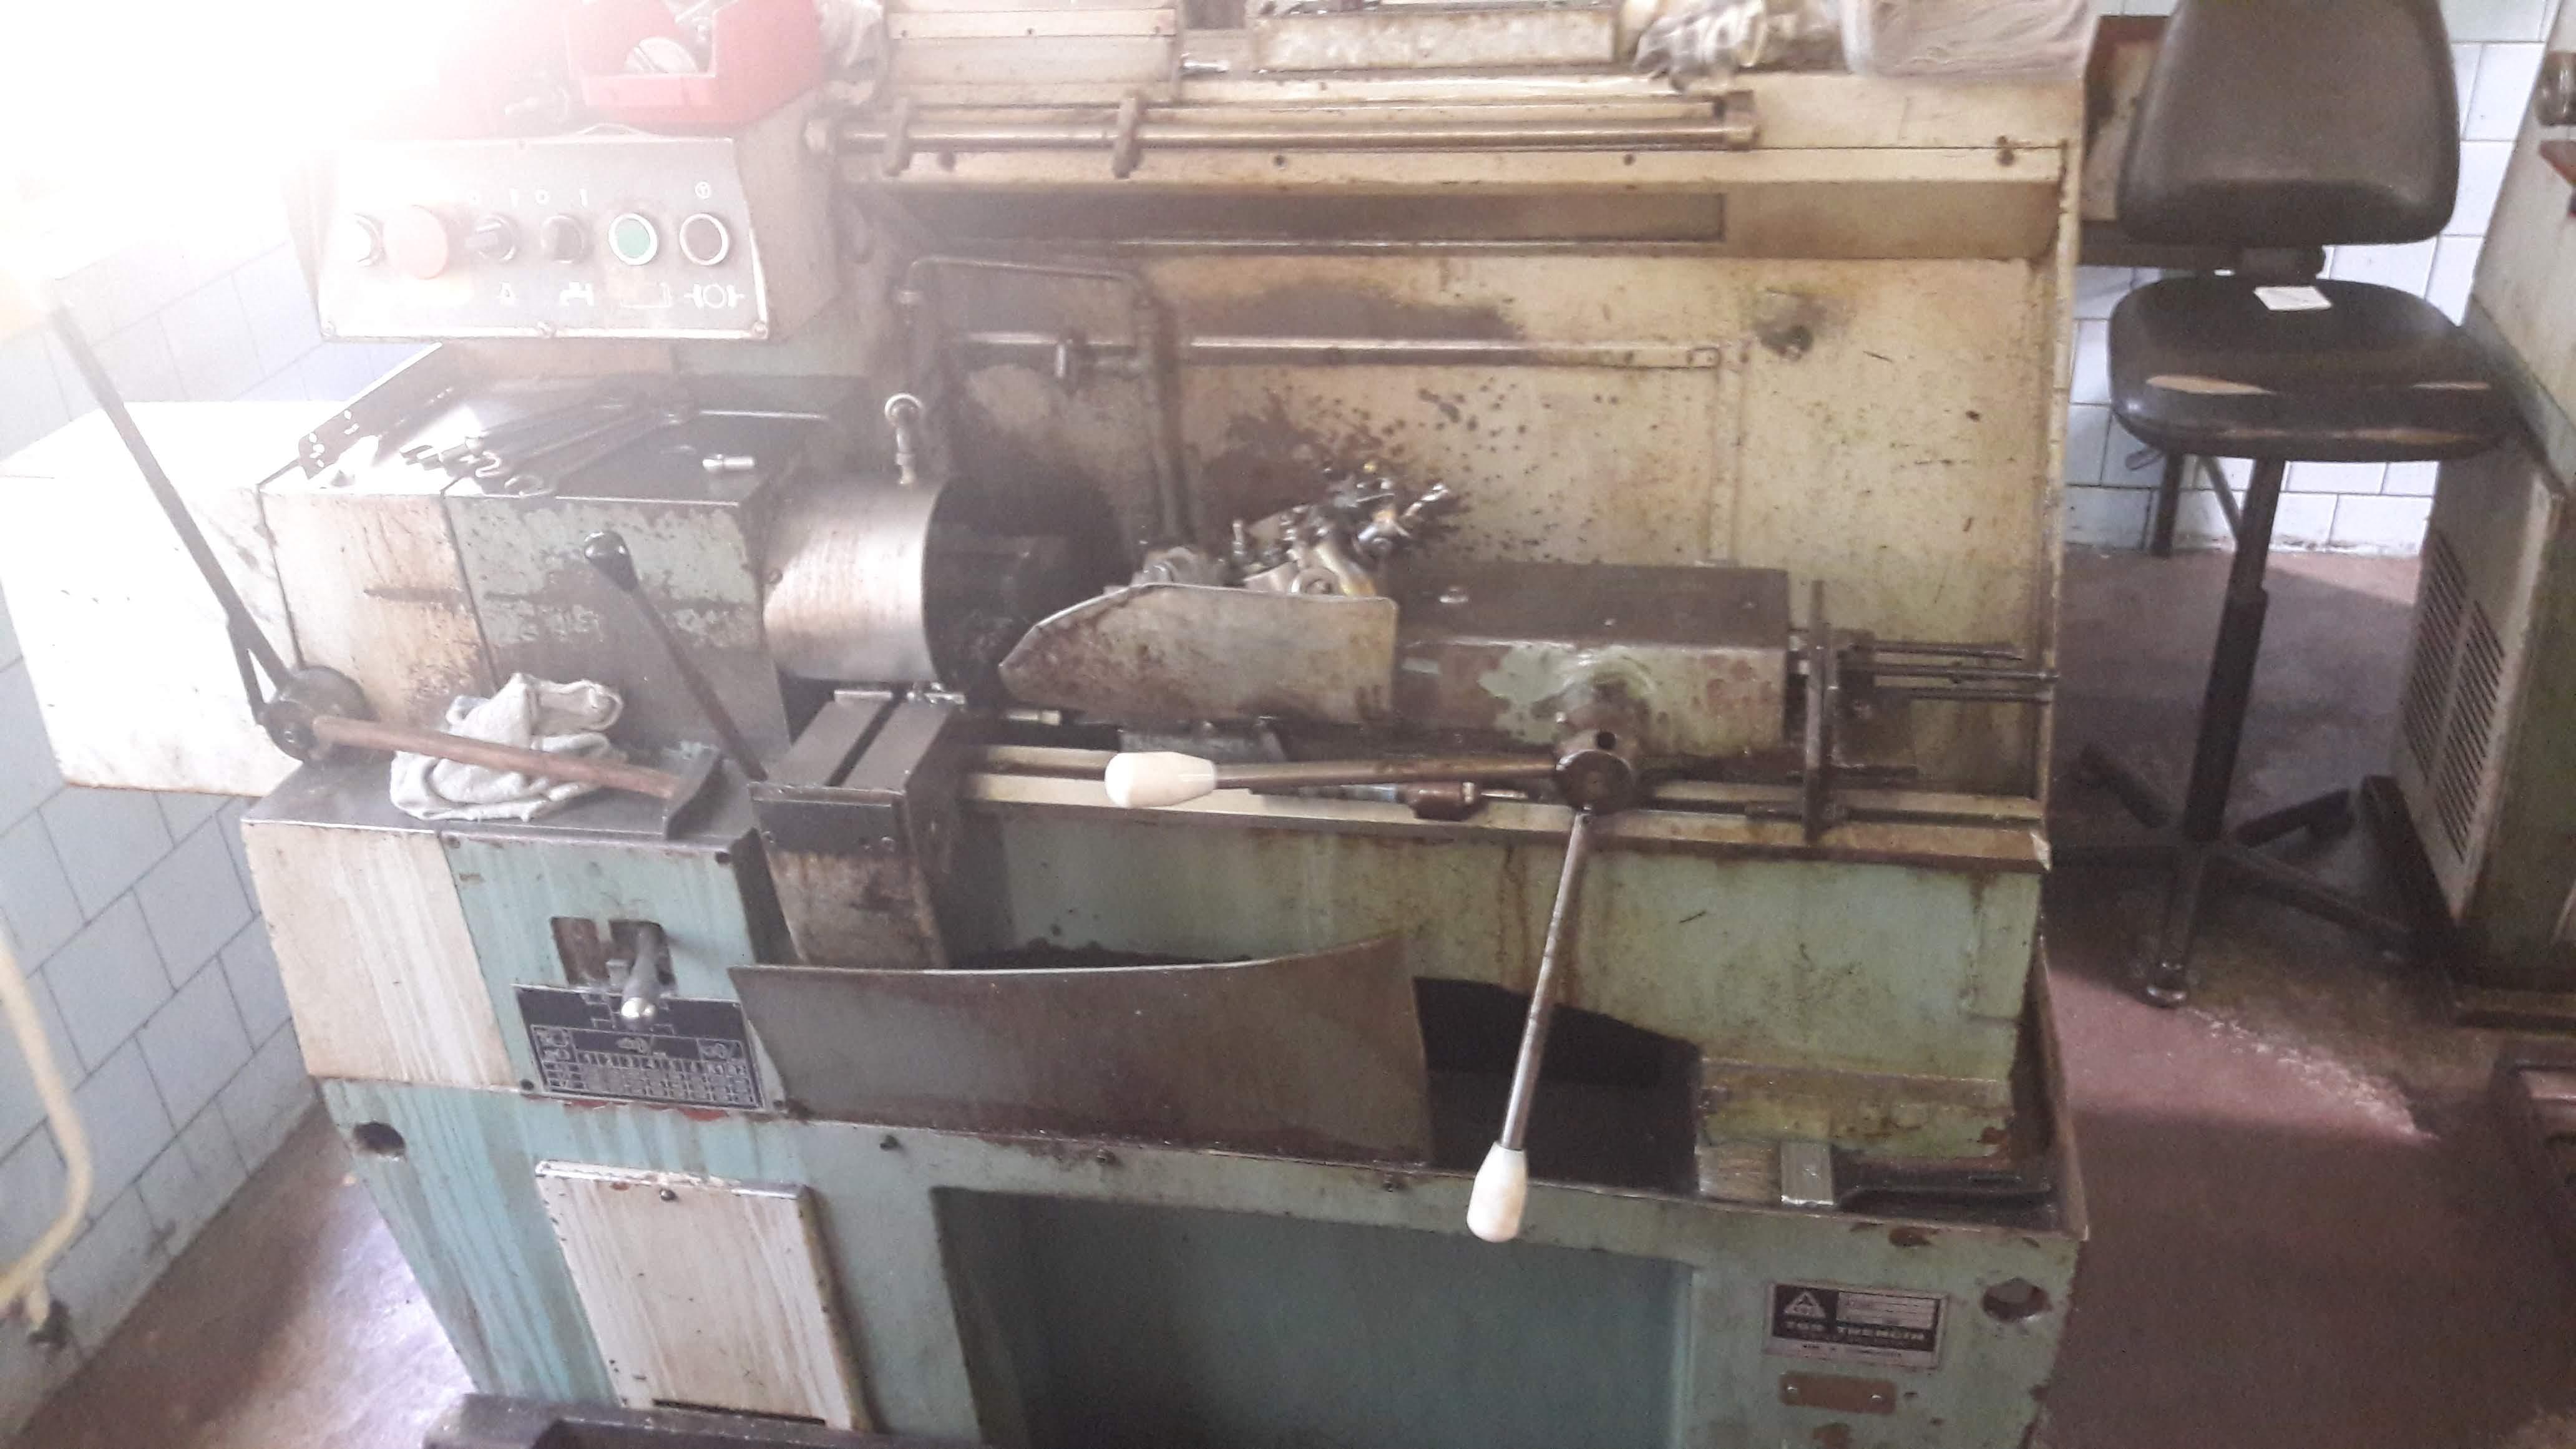 5048-automatic lathe line.41